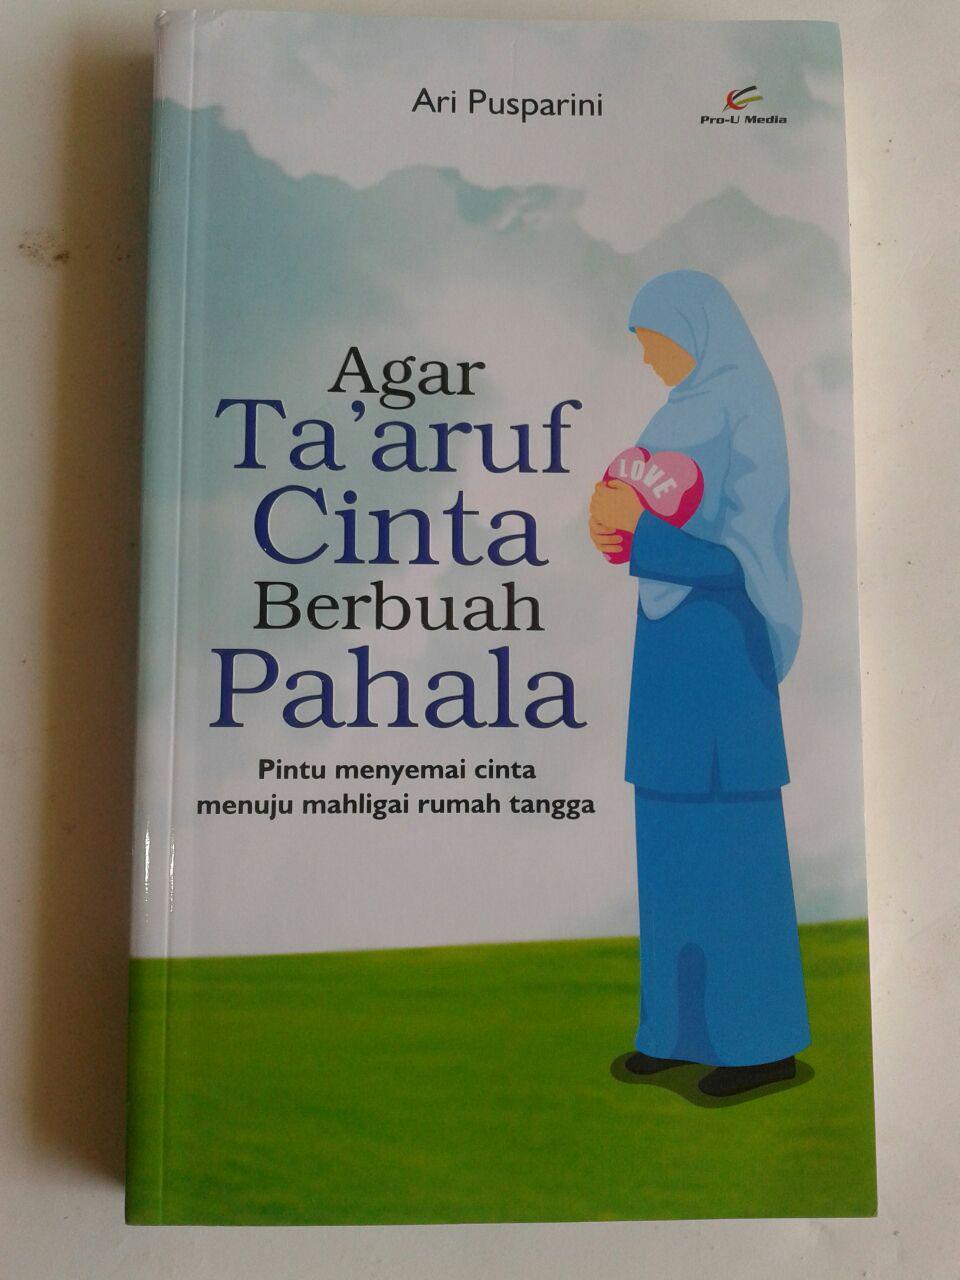 Buku Agar Taaruf Cinta Berbuah Pahala cover 2